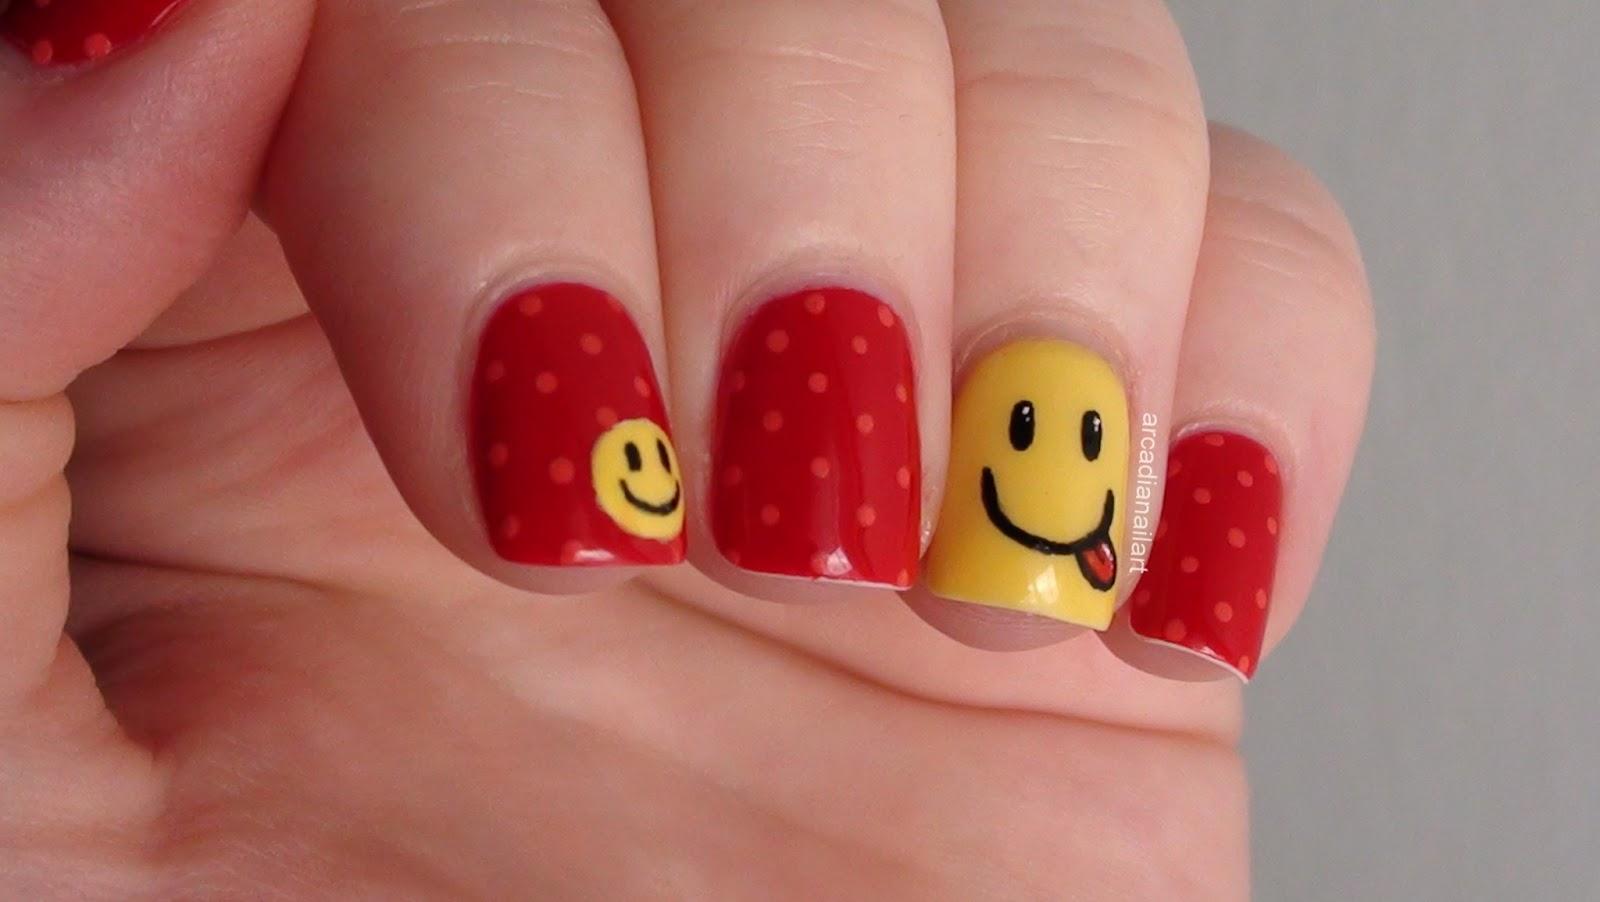 ArcadiaNailArt Smiley Face Nail Art Tutorial